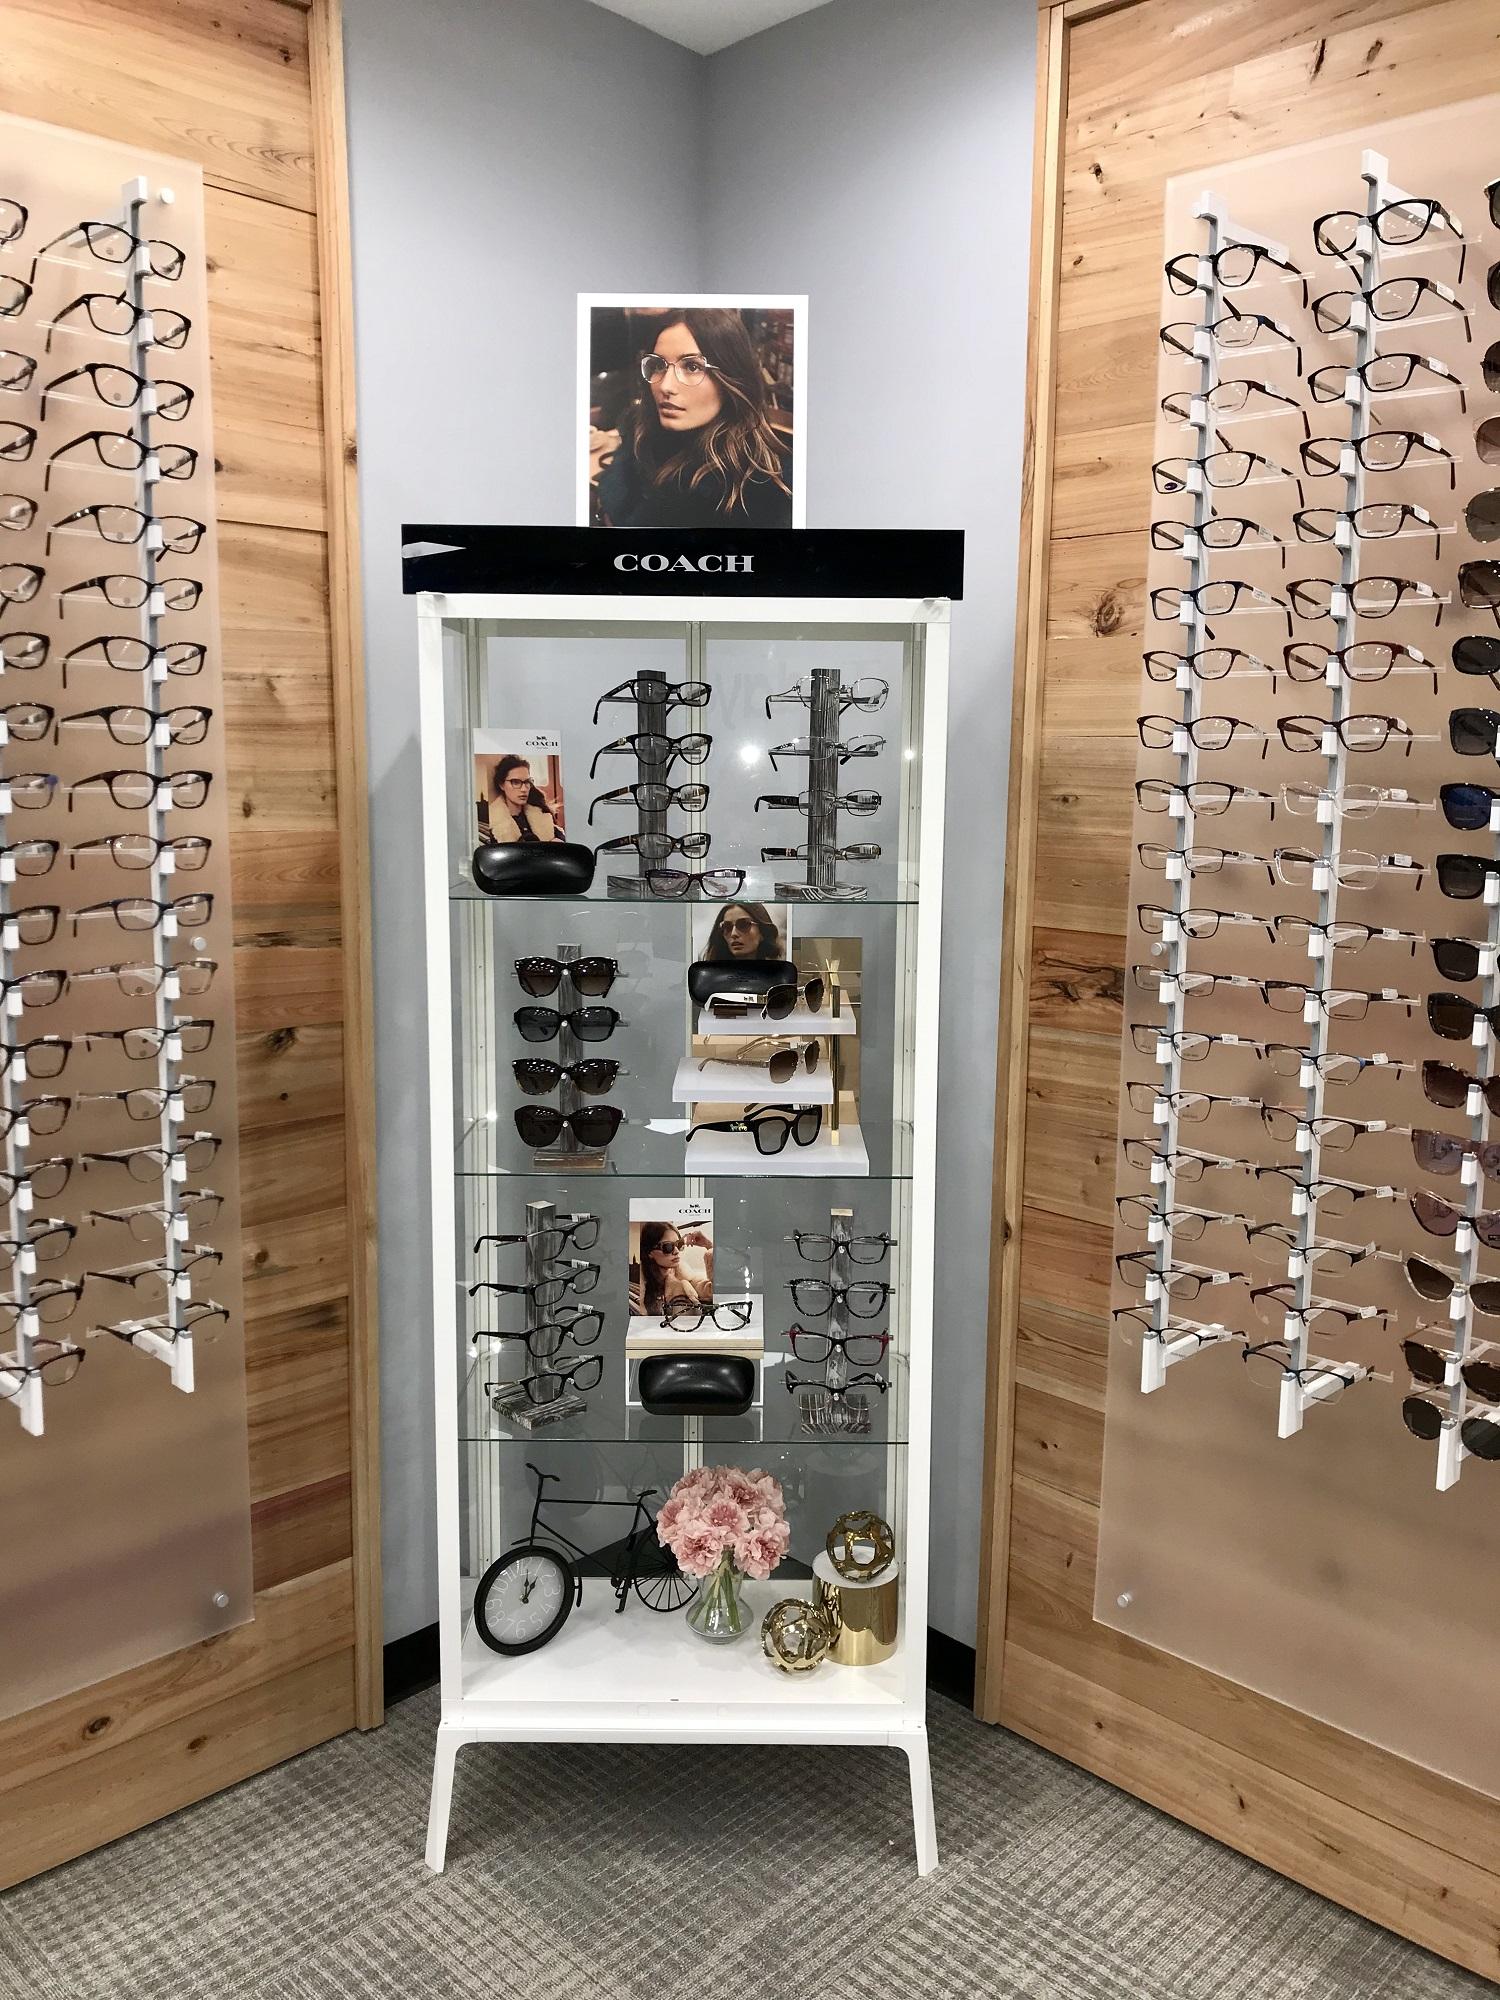 Coach eyeglass display